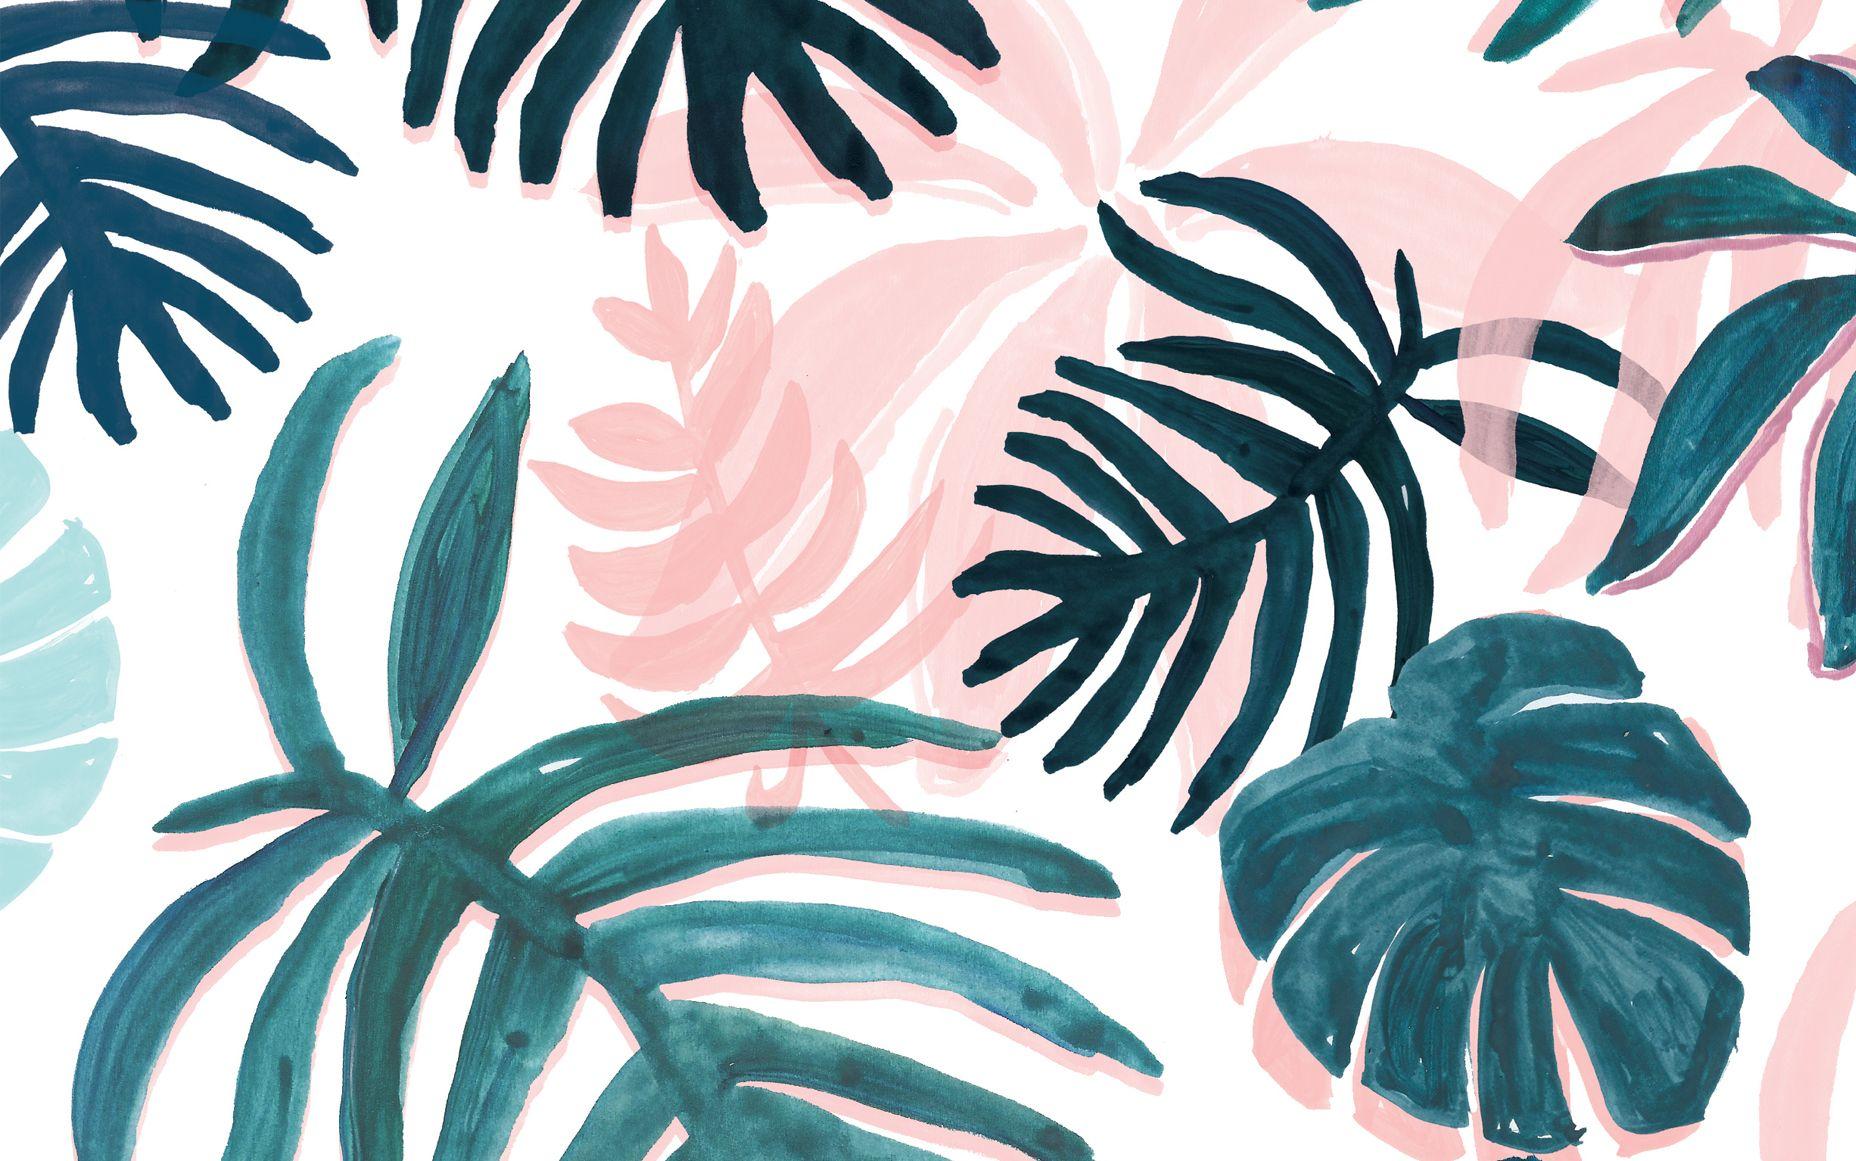 Hd Wallpaper For Desktop Pinterest